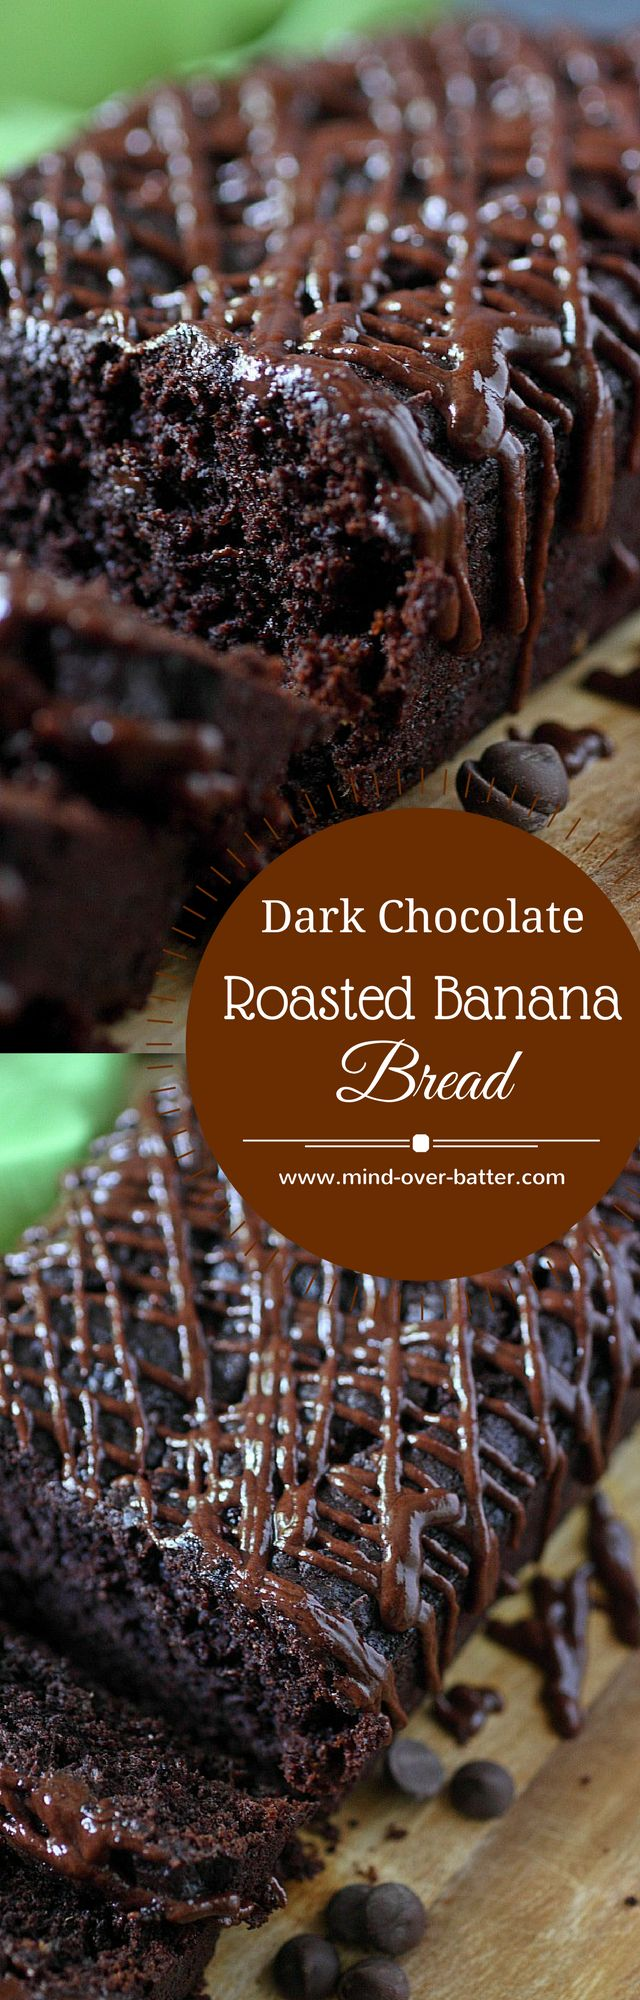 Dark Chocolate Roasted Banana Bread -- www.mind-over-batter.com